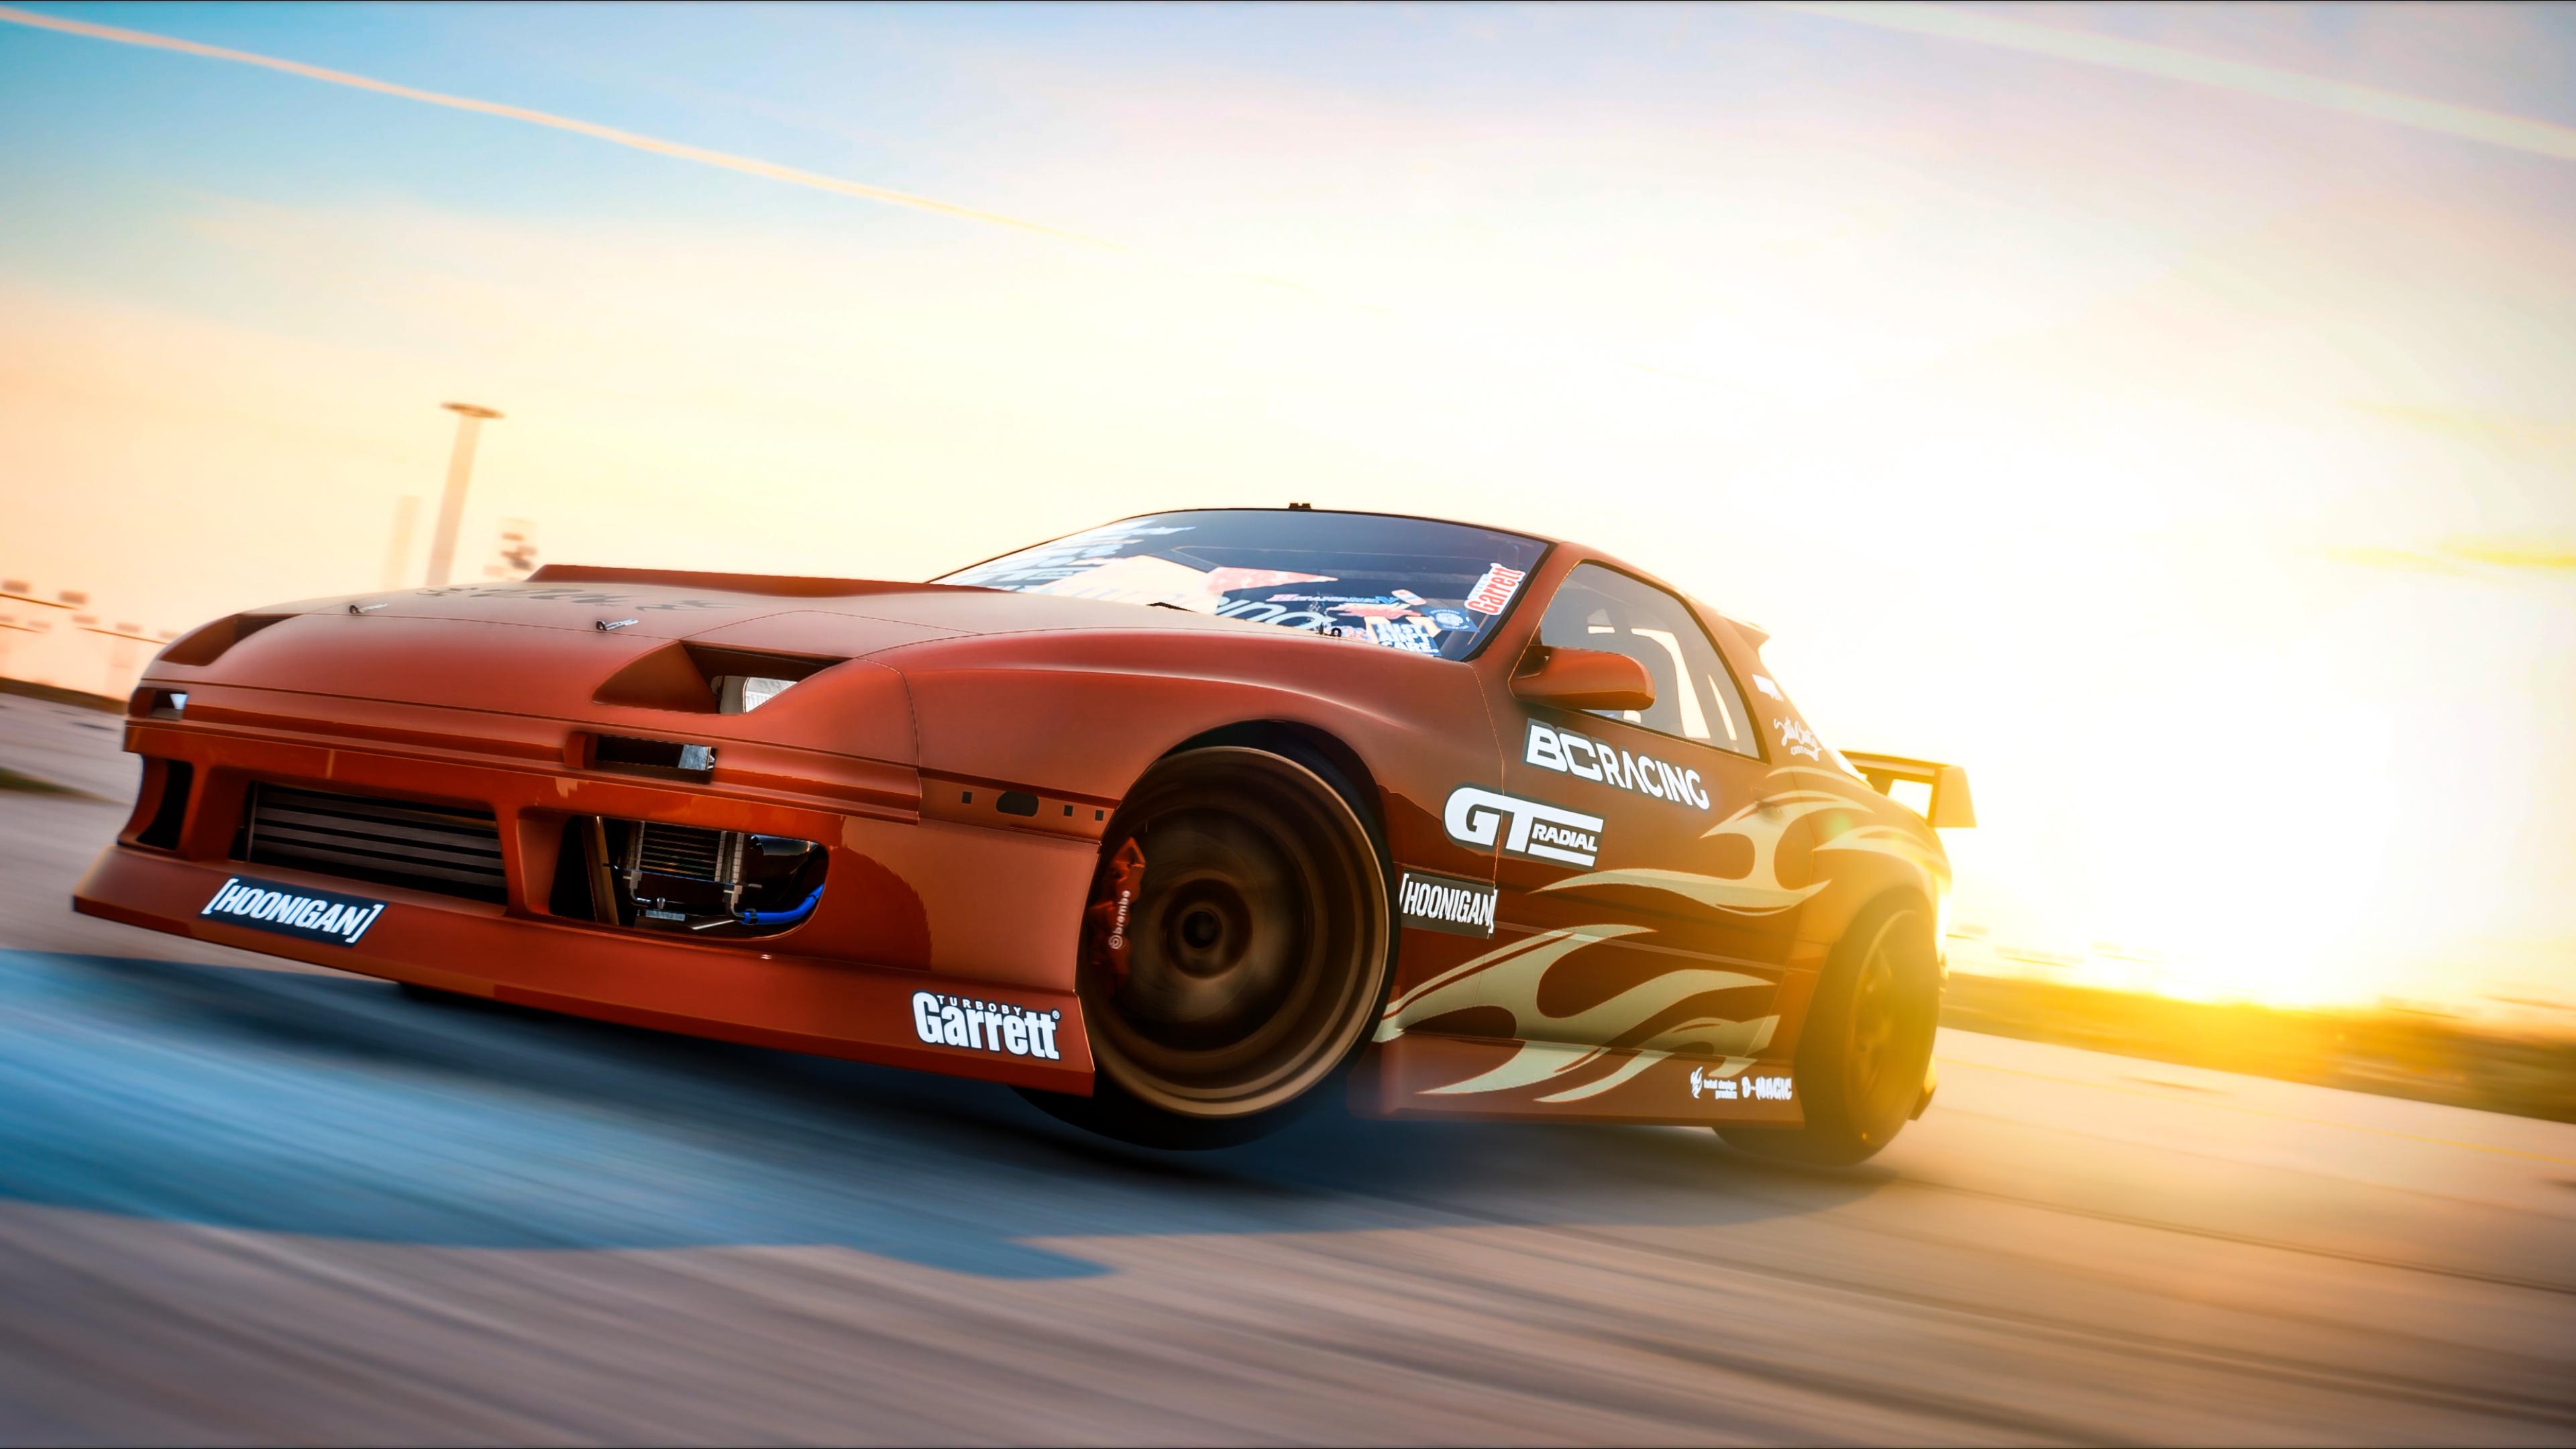 Drifting Cars In Gta 5 4k, HD Cars, 4k Wallpapers, Images ...